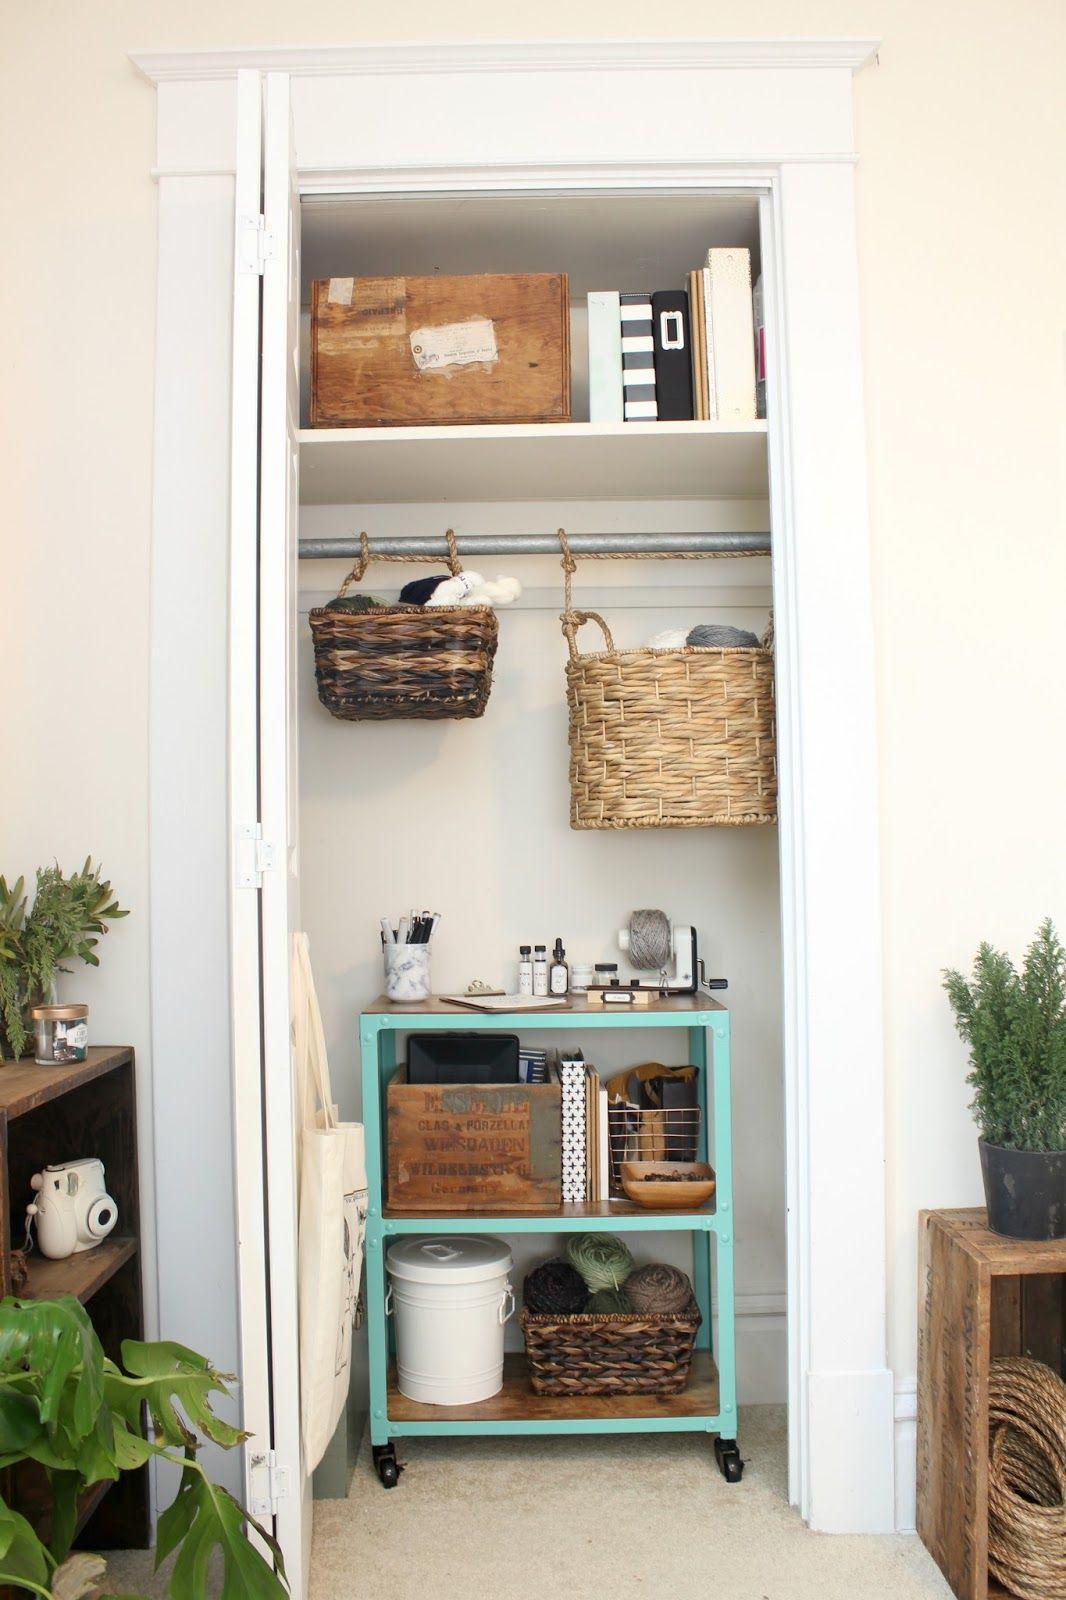 Pin by Shae Solomon on HOME | Tiny closet solutions, Tiny ...